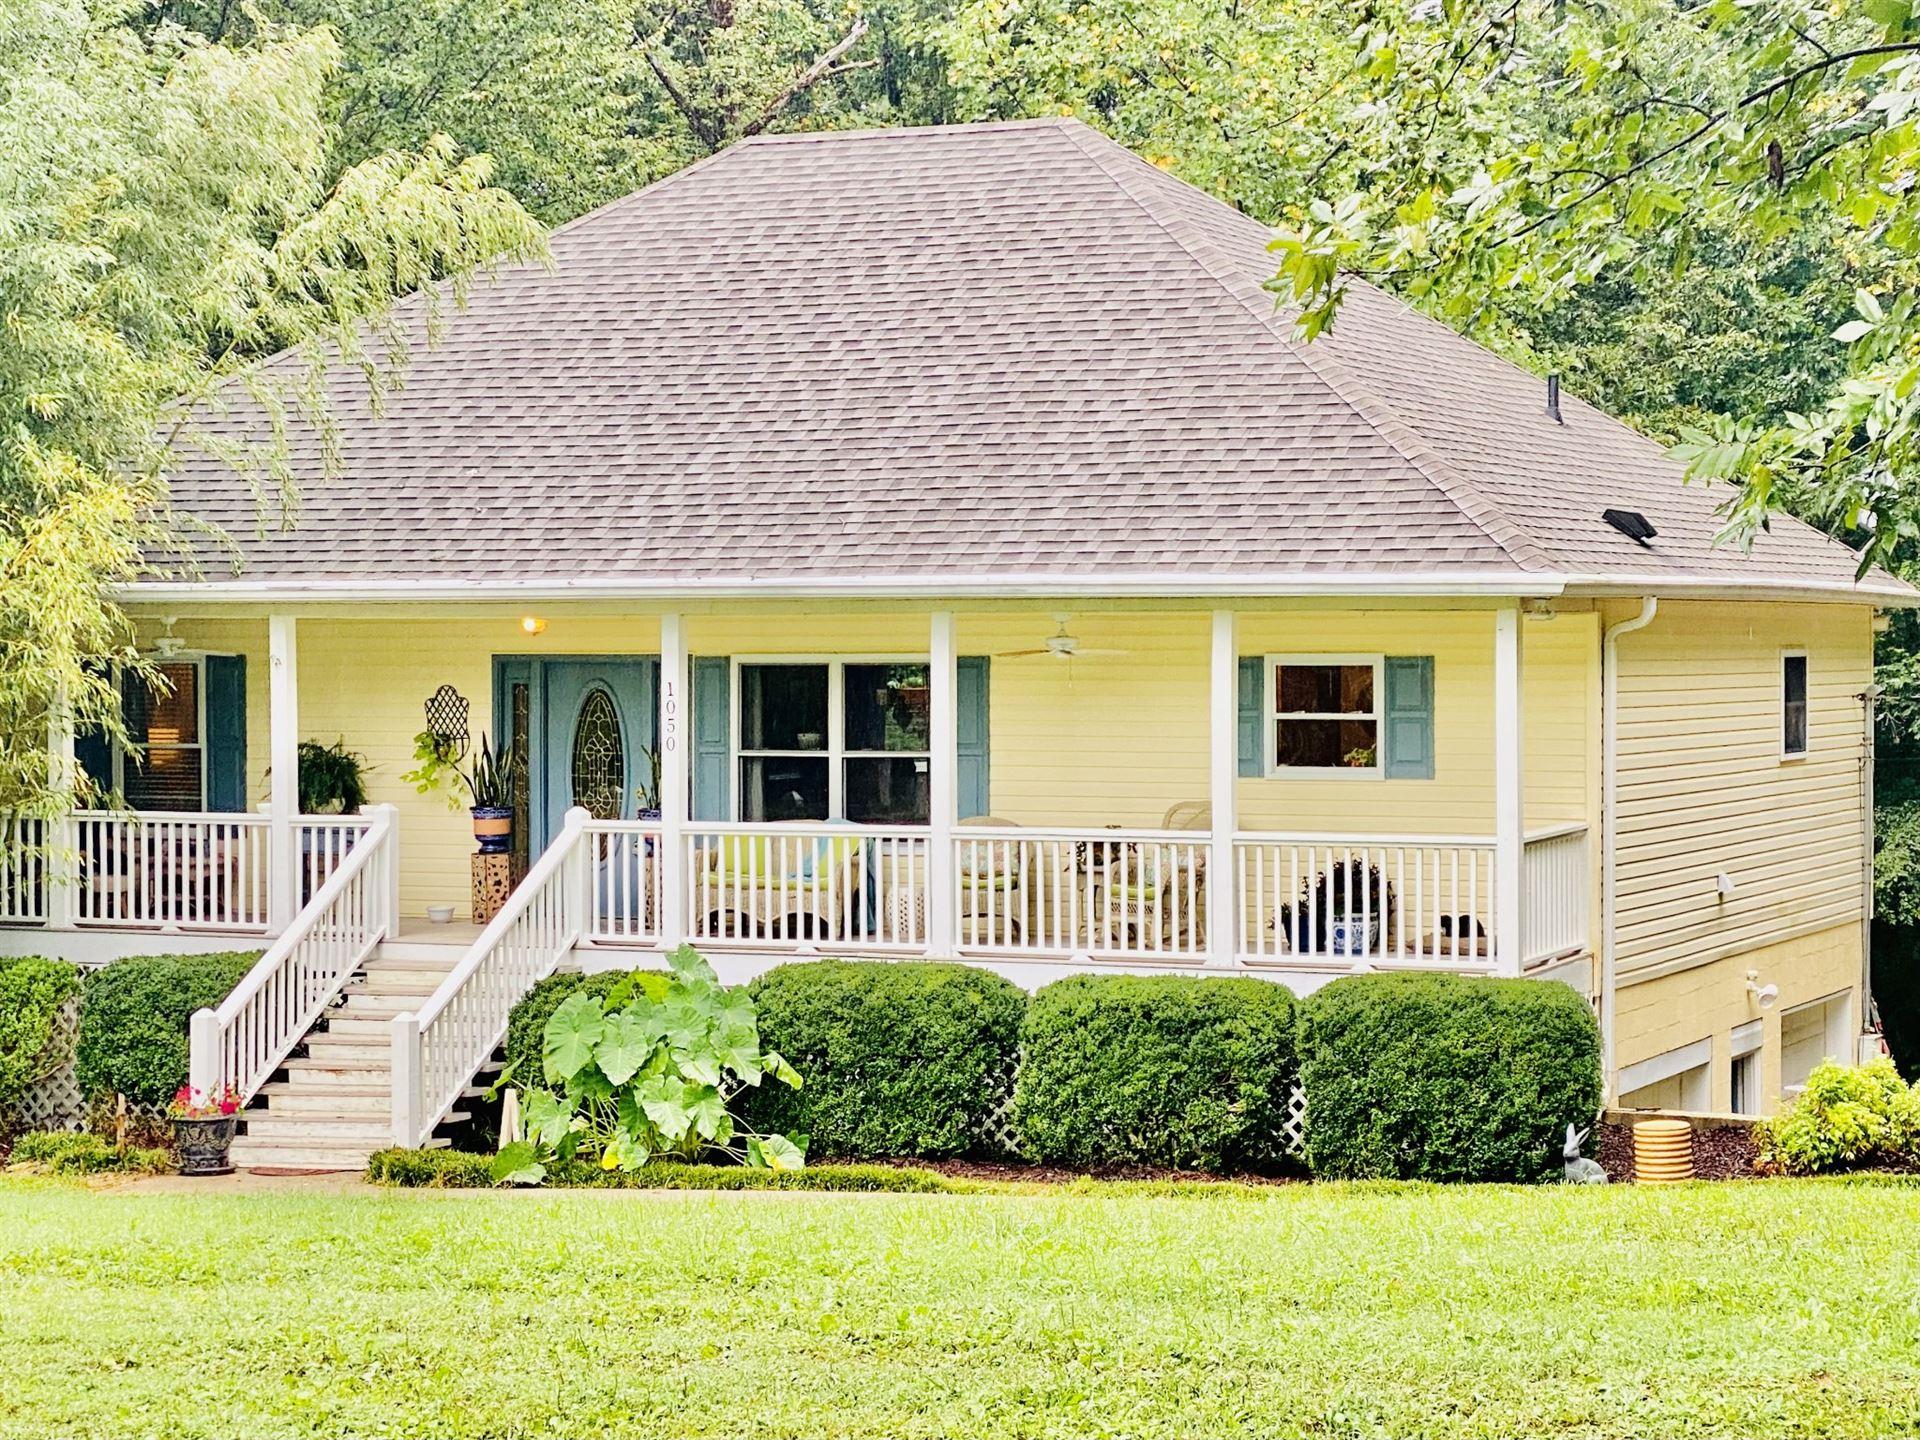 1050 Chickadee Trl, Kingston Springs, TN 37082 - MLS#: 2284354